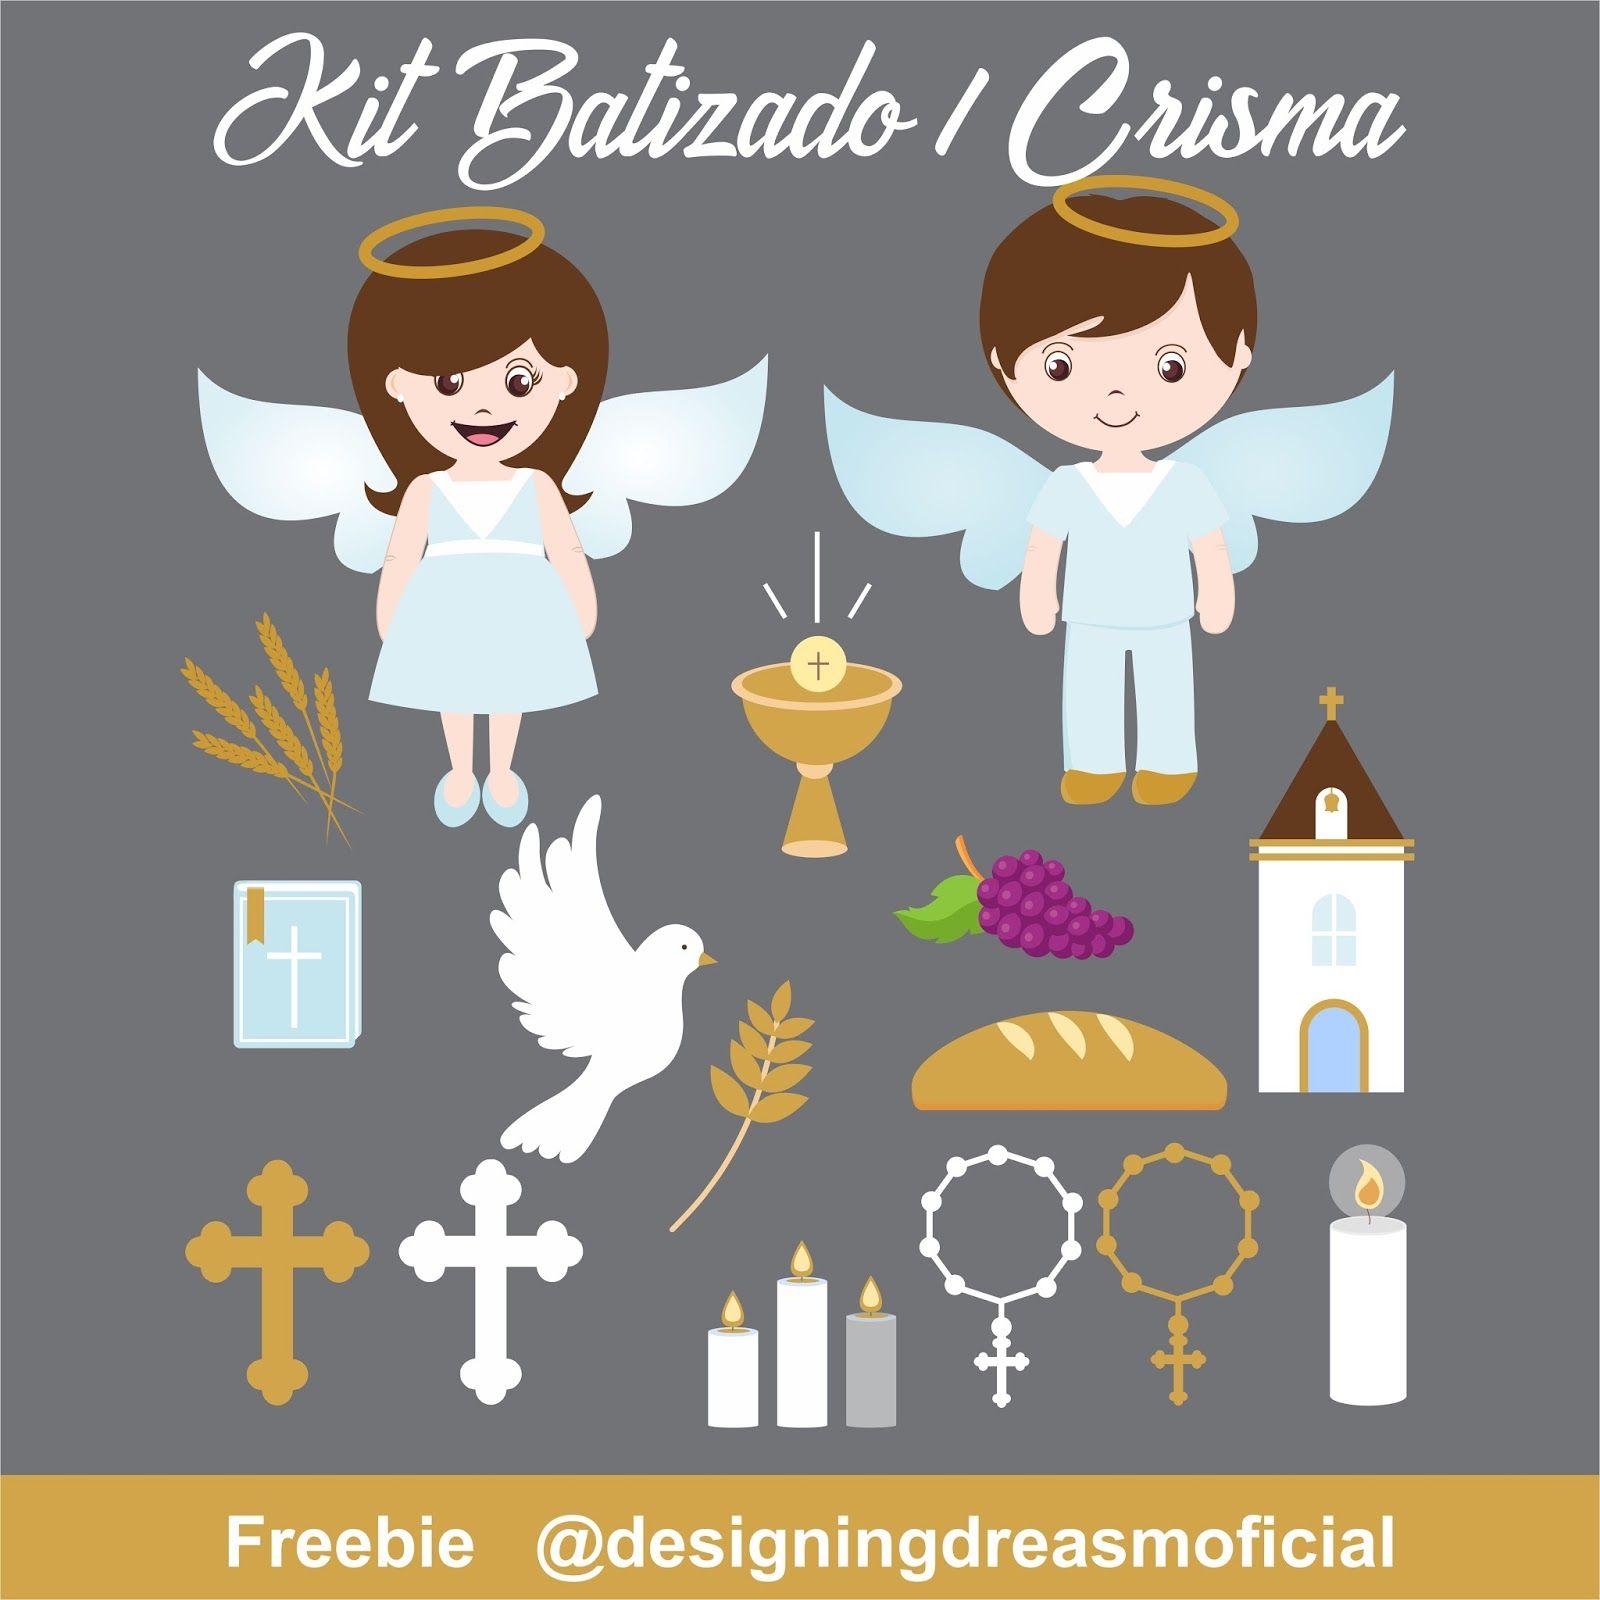 Tag Etiquetas Gratis Para Imprimir Ideias Para Batismo Crisma E